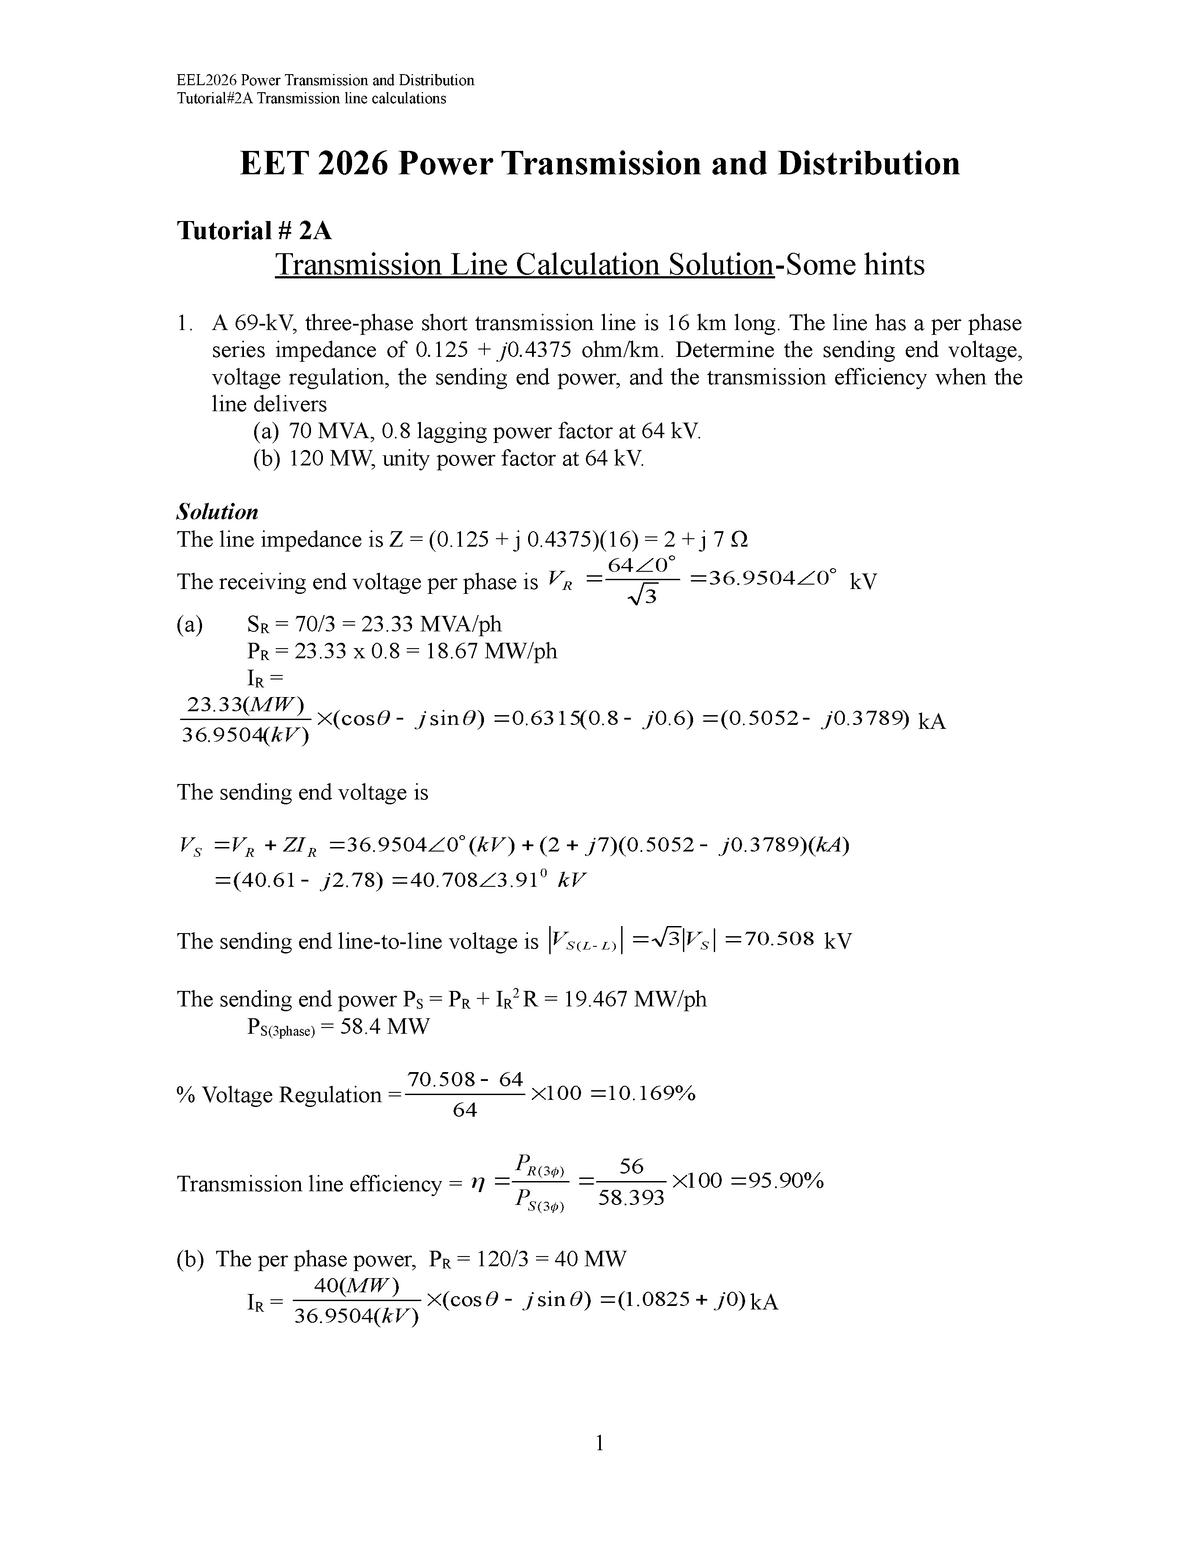 EEL2026 Tut-2A Transmission Line Solutions - - StuDocu